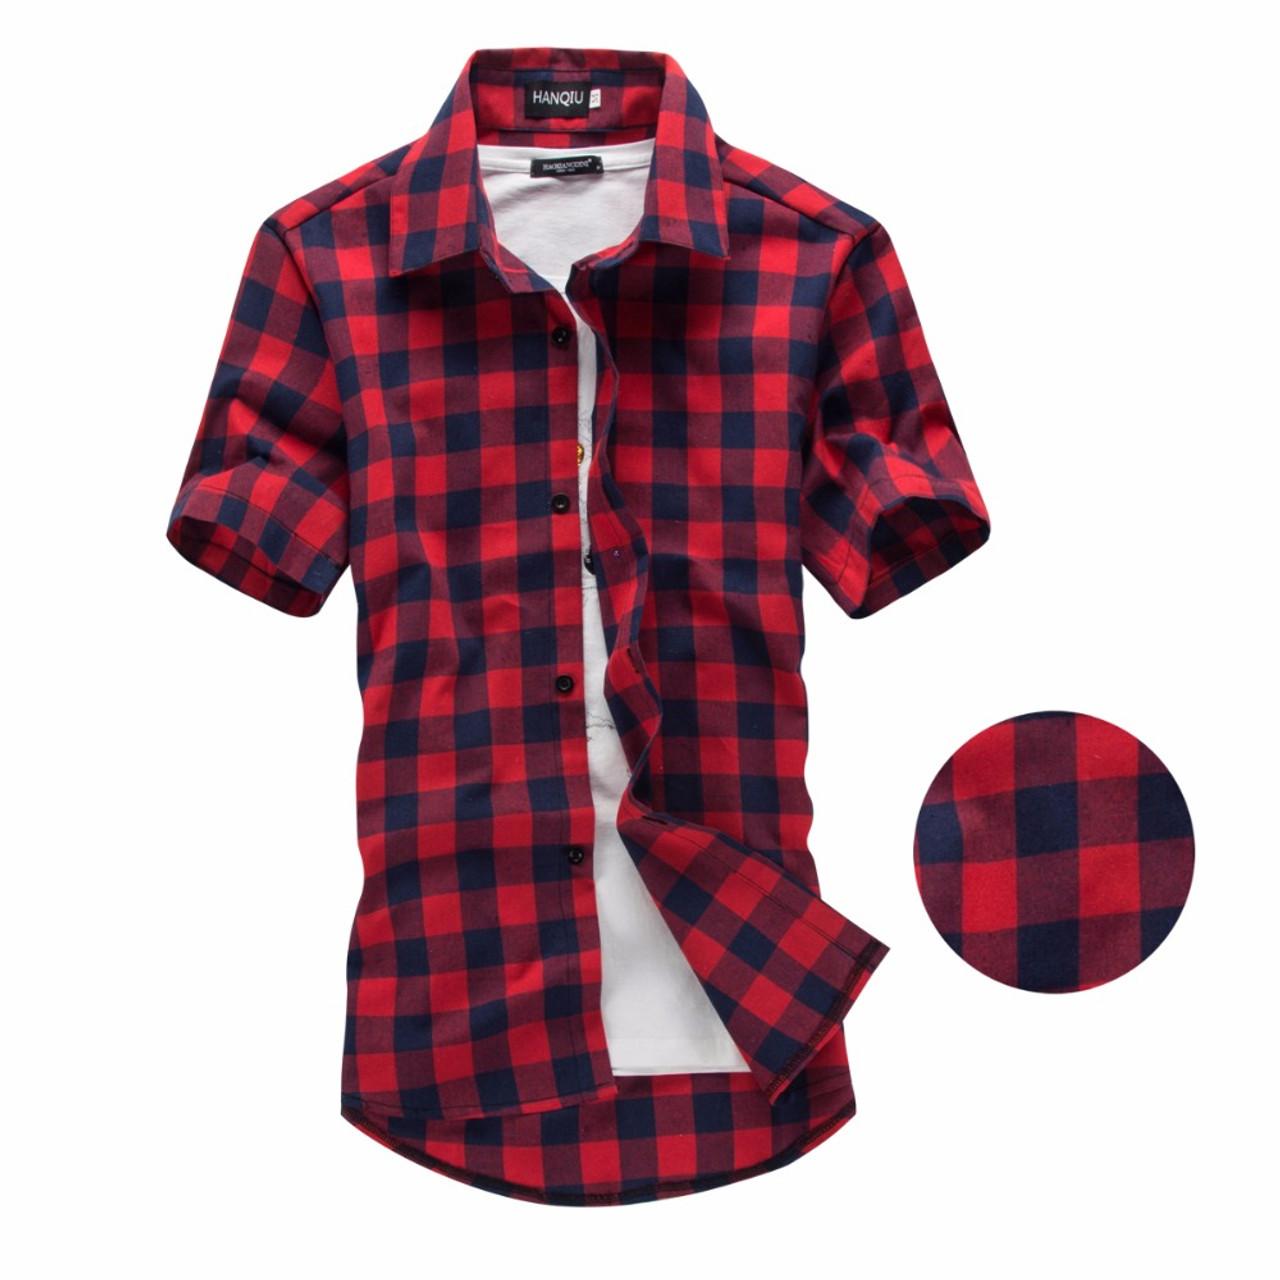 e473349c2e5 ... Red And Black Plaid Shirt Men Shirts 2018 New Summer Fashion Chemise  Homme Mens Checkered Shirts ...